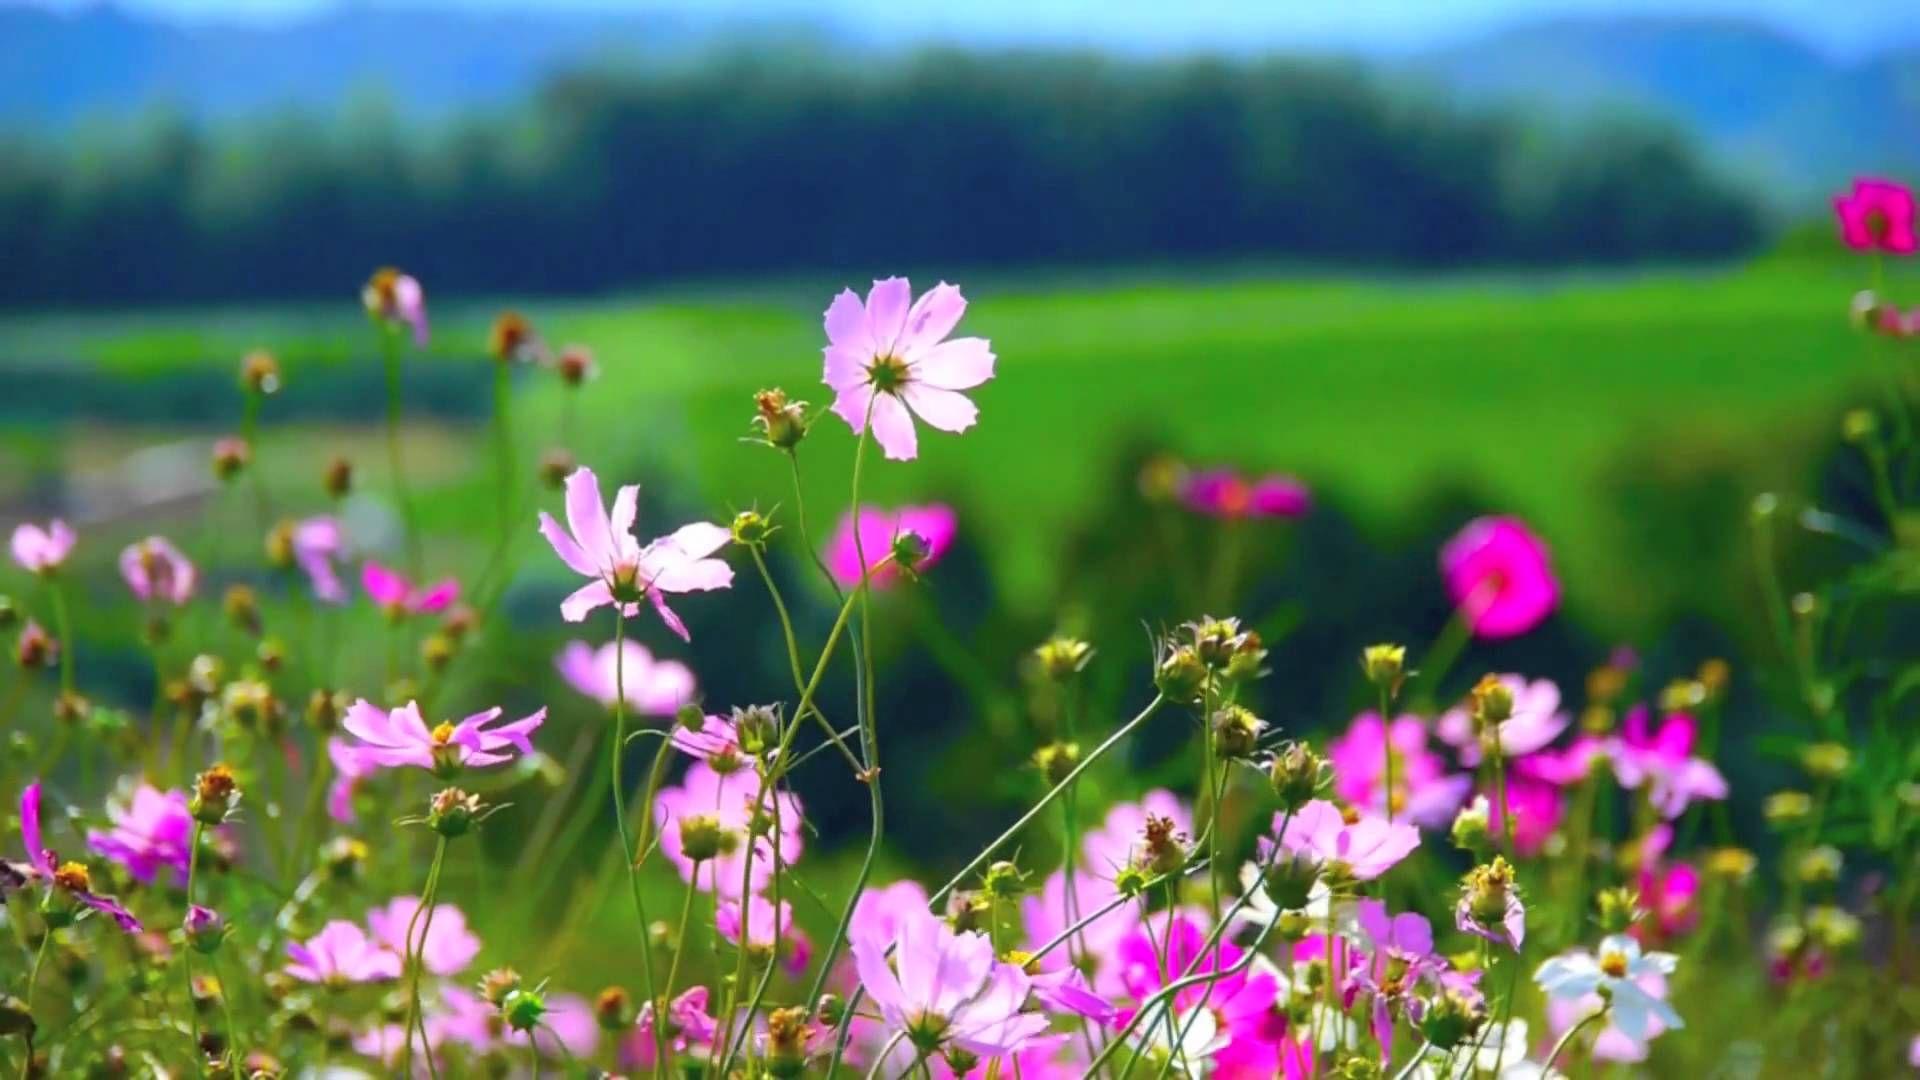 Flowers 55 Video Background Hd 1080p Cicek Amazing flower video wallpapers